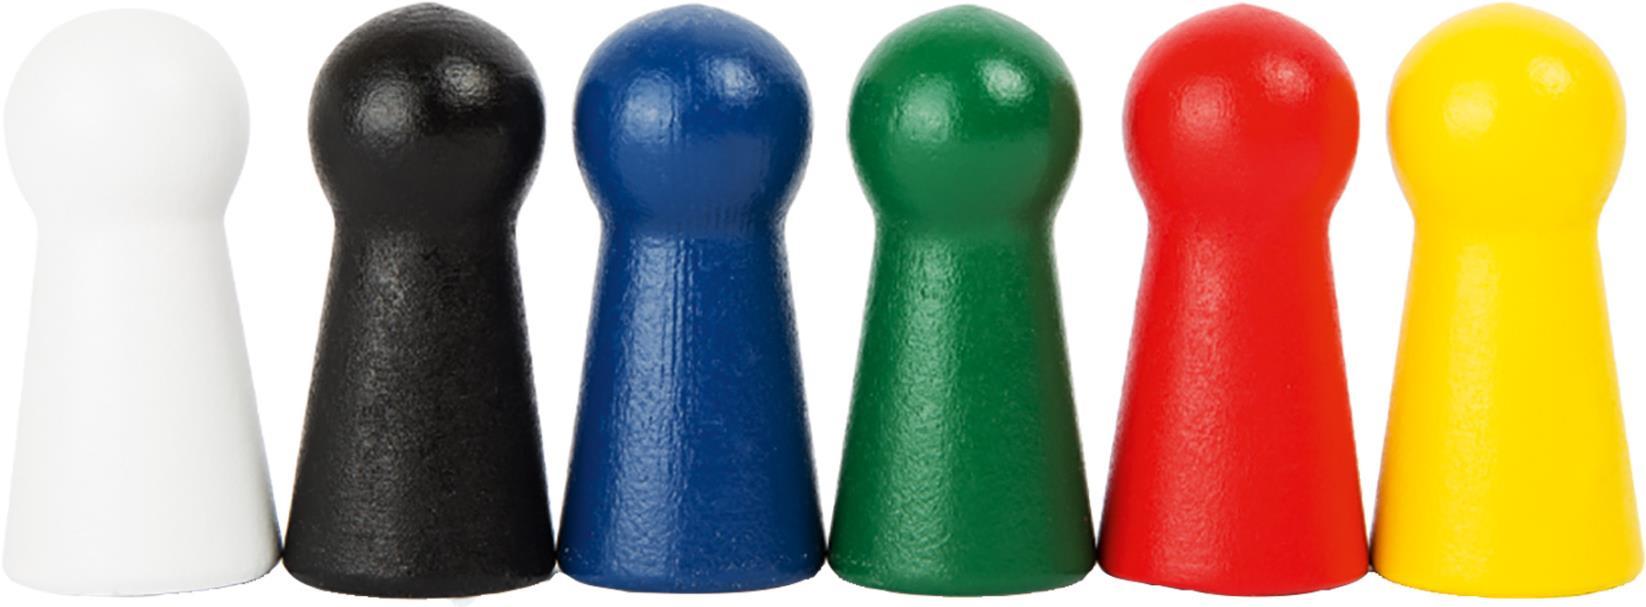 Ludo For 6 Players à France 4 Ludo